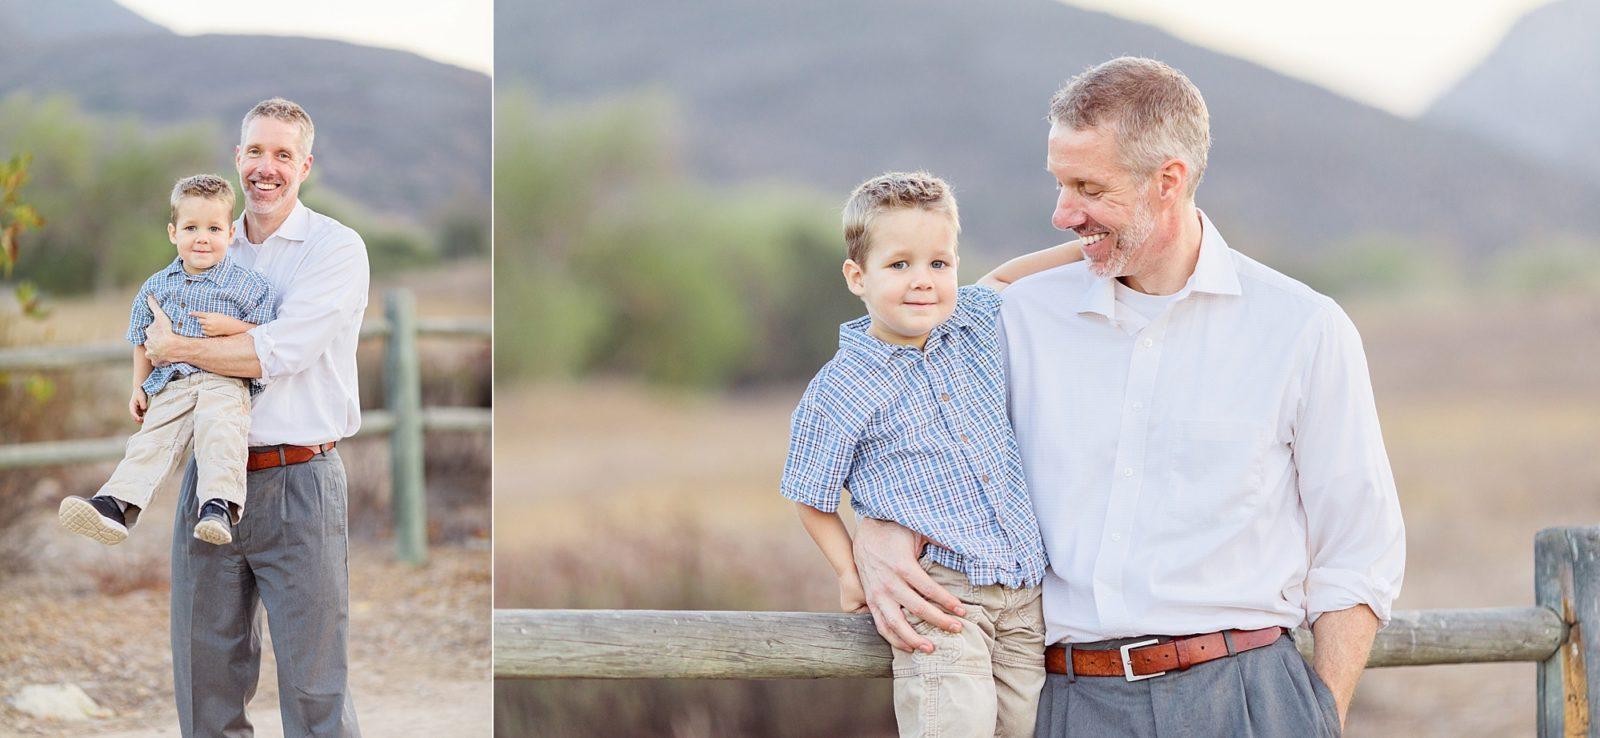 San Diego Photographers | San Diego Family Photography